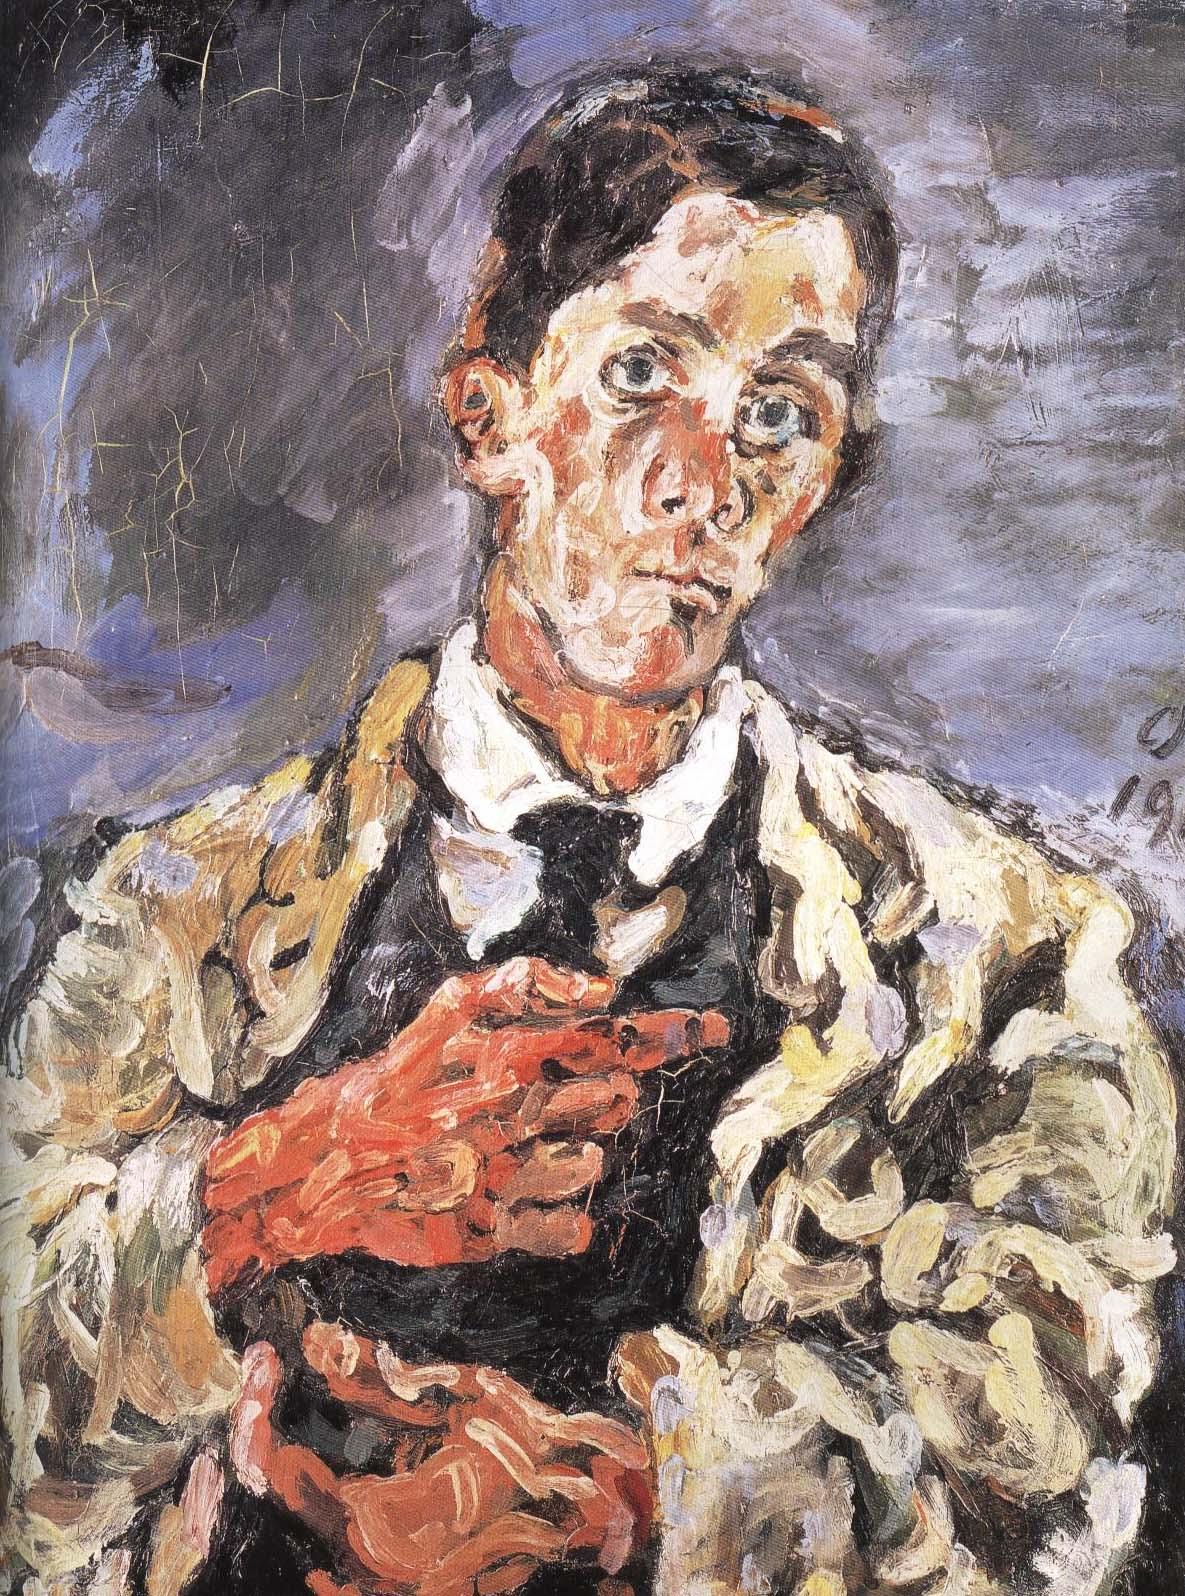 Self Portrait | Oskar Kokoschka 1917 | Oil Painting